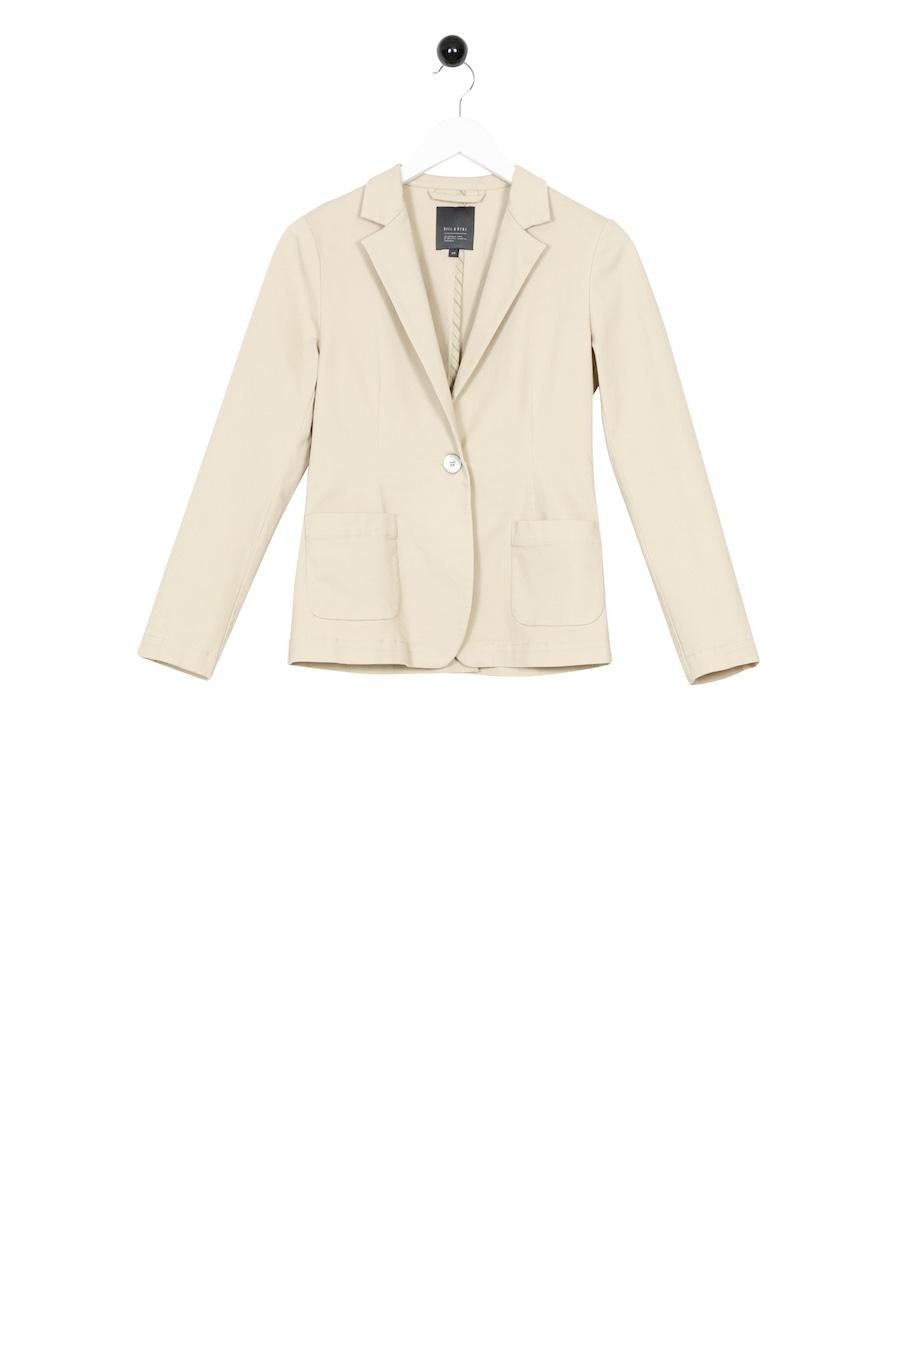 Sand Jacket